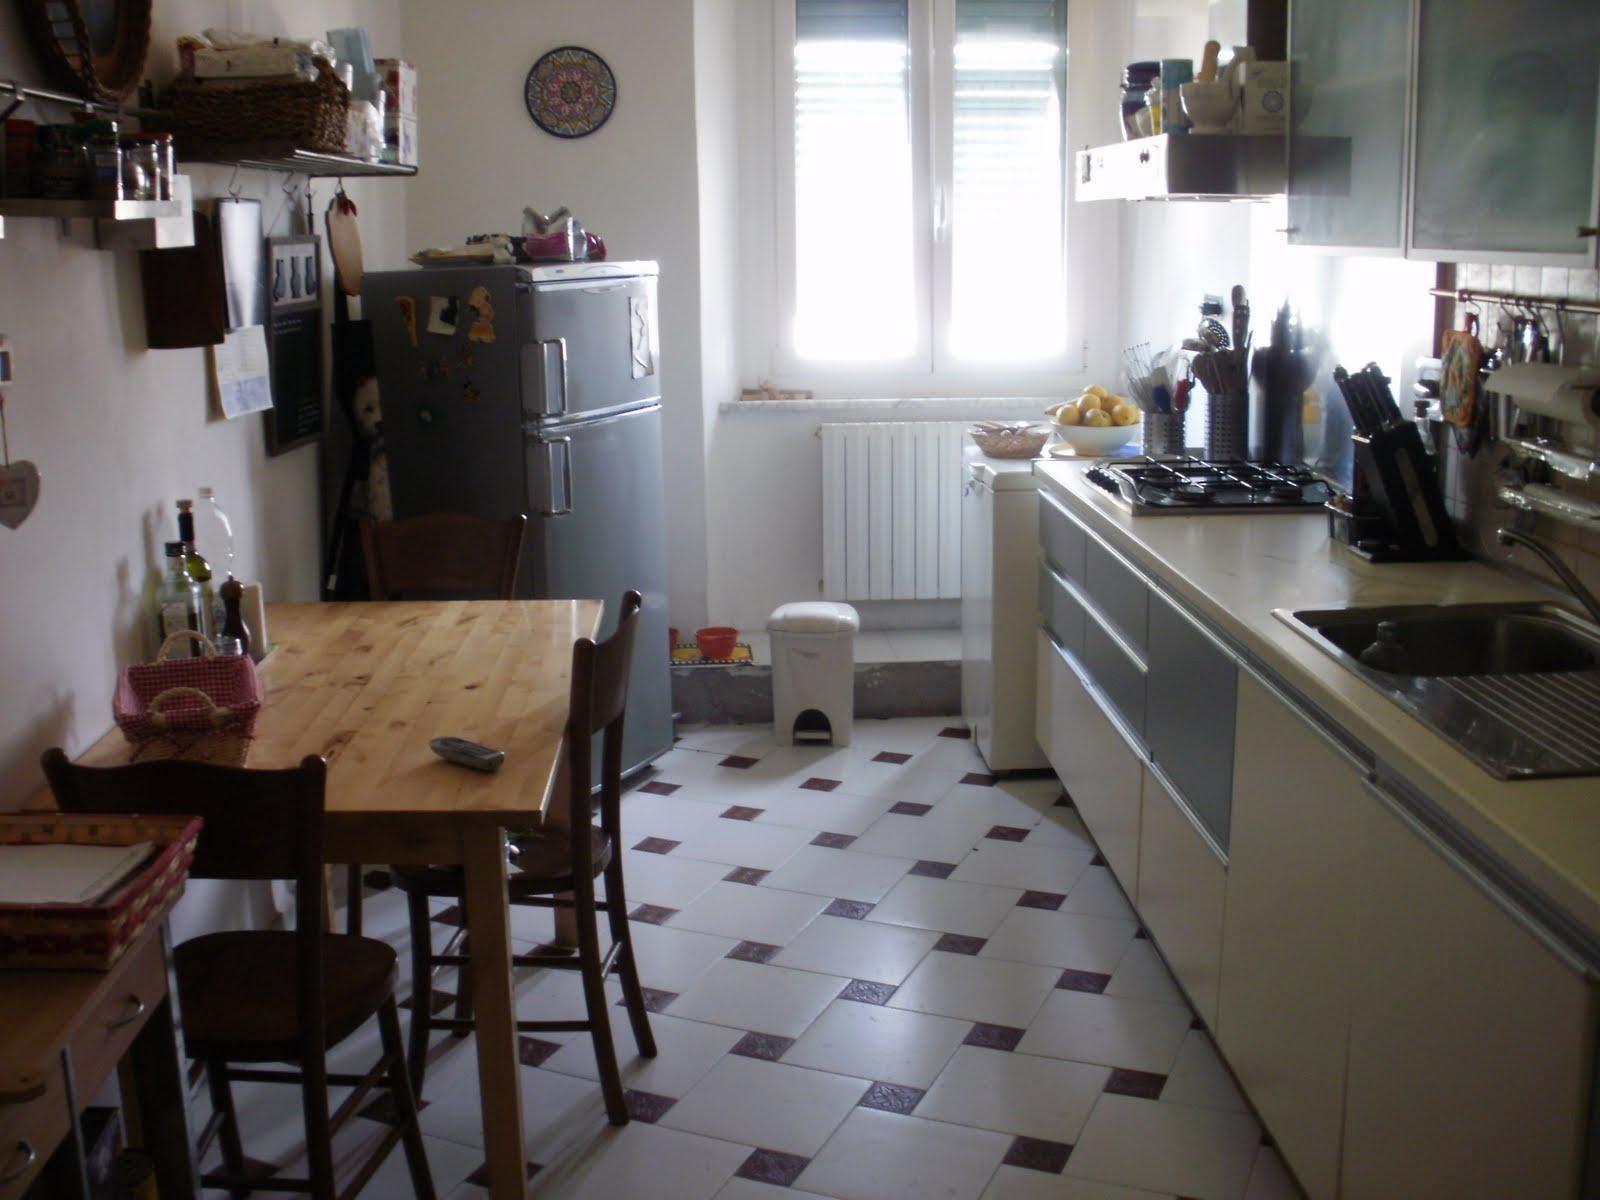 in cucina con nonnageca: il cuore in cucina - Cose Di Casa Cucine